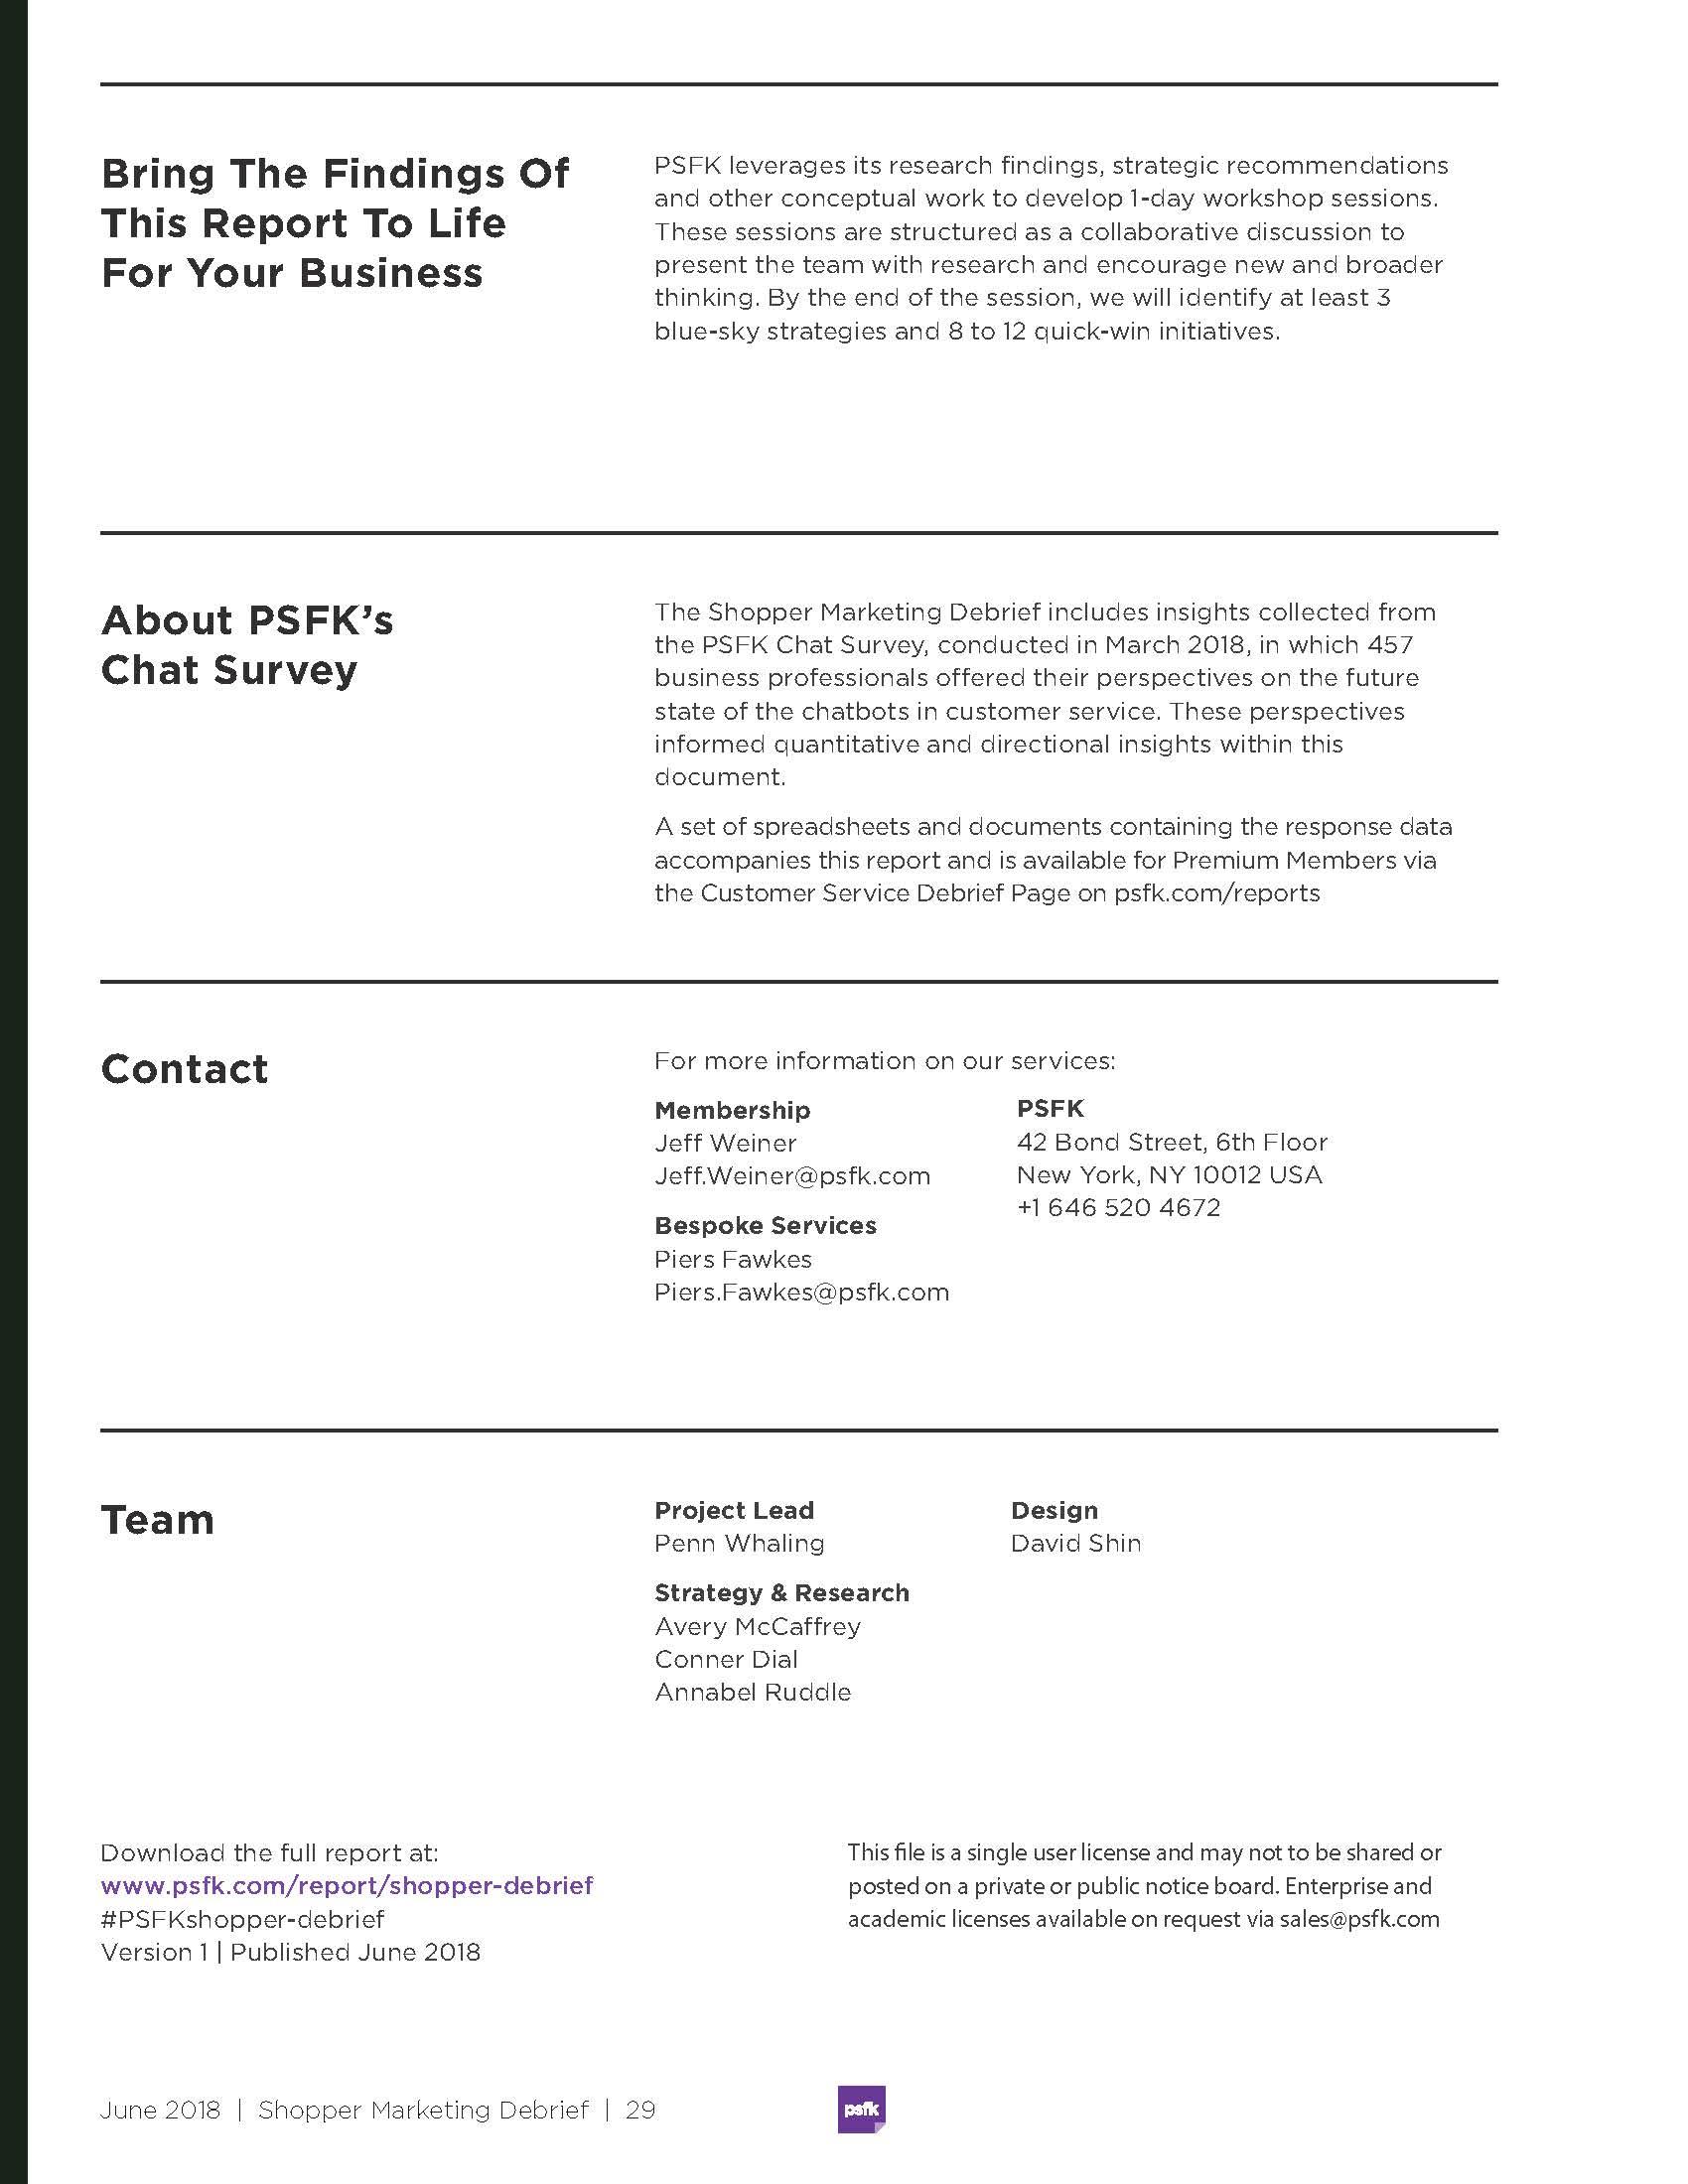 PSFK_AnnabelRuddle_Report_ShopperMarketingDebrief_Page_29.jpg